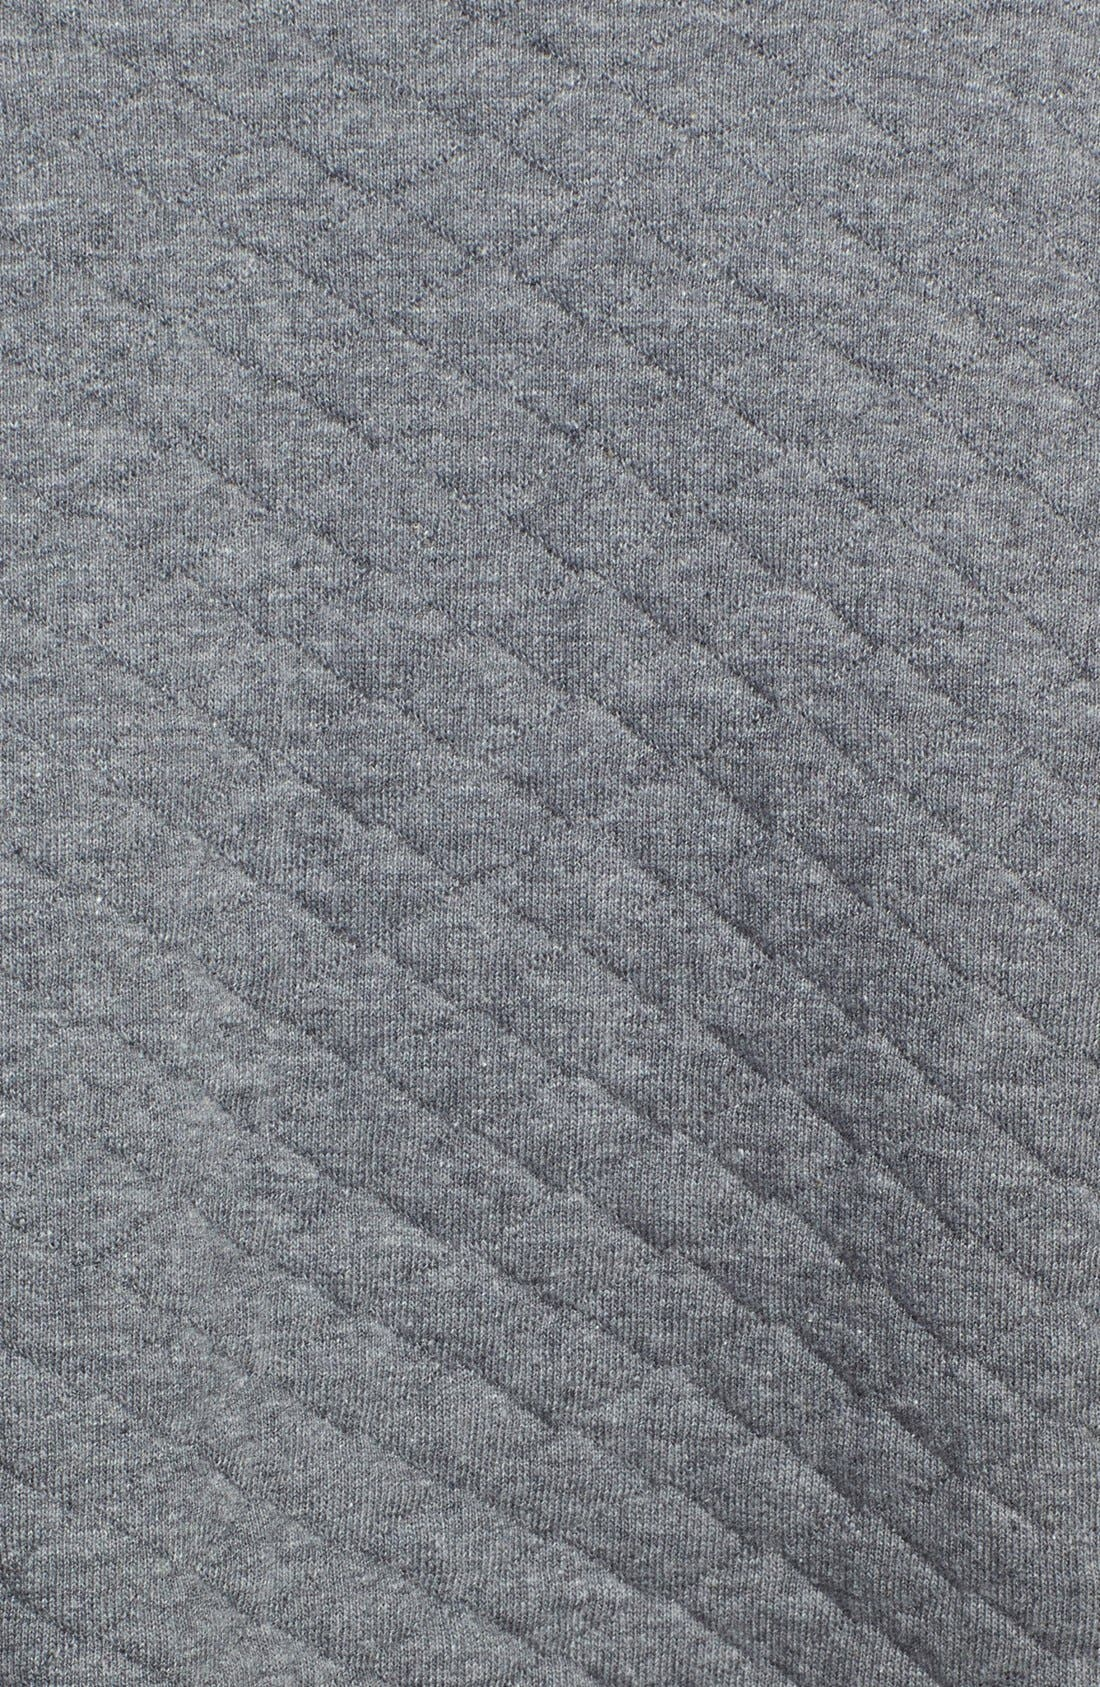 Alternate Image 3  - Caslon® Quilted Cotton Blend Knit Blazer (Regular & Petite)